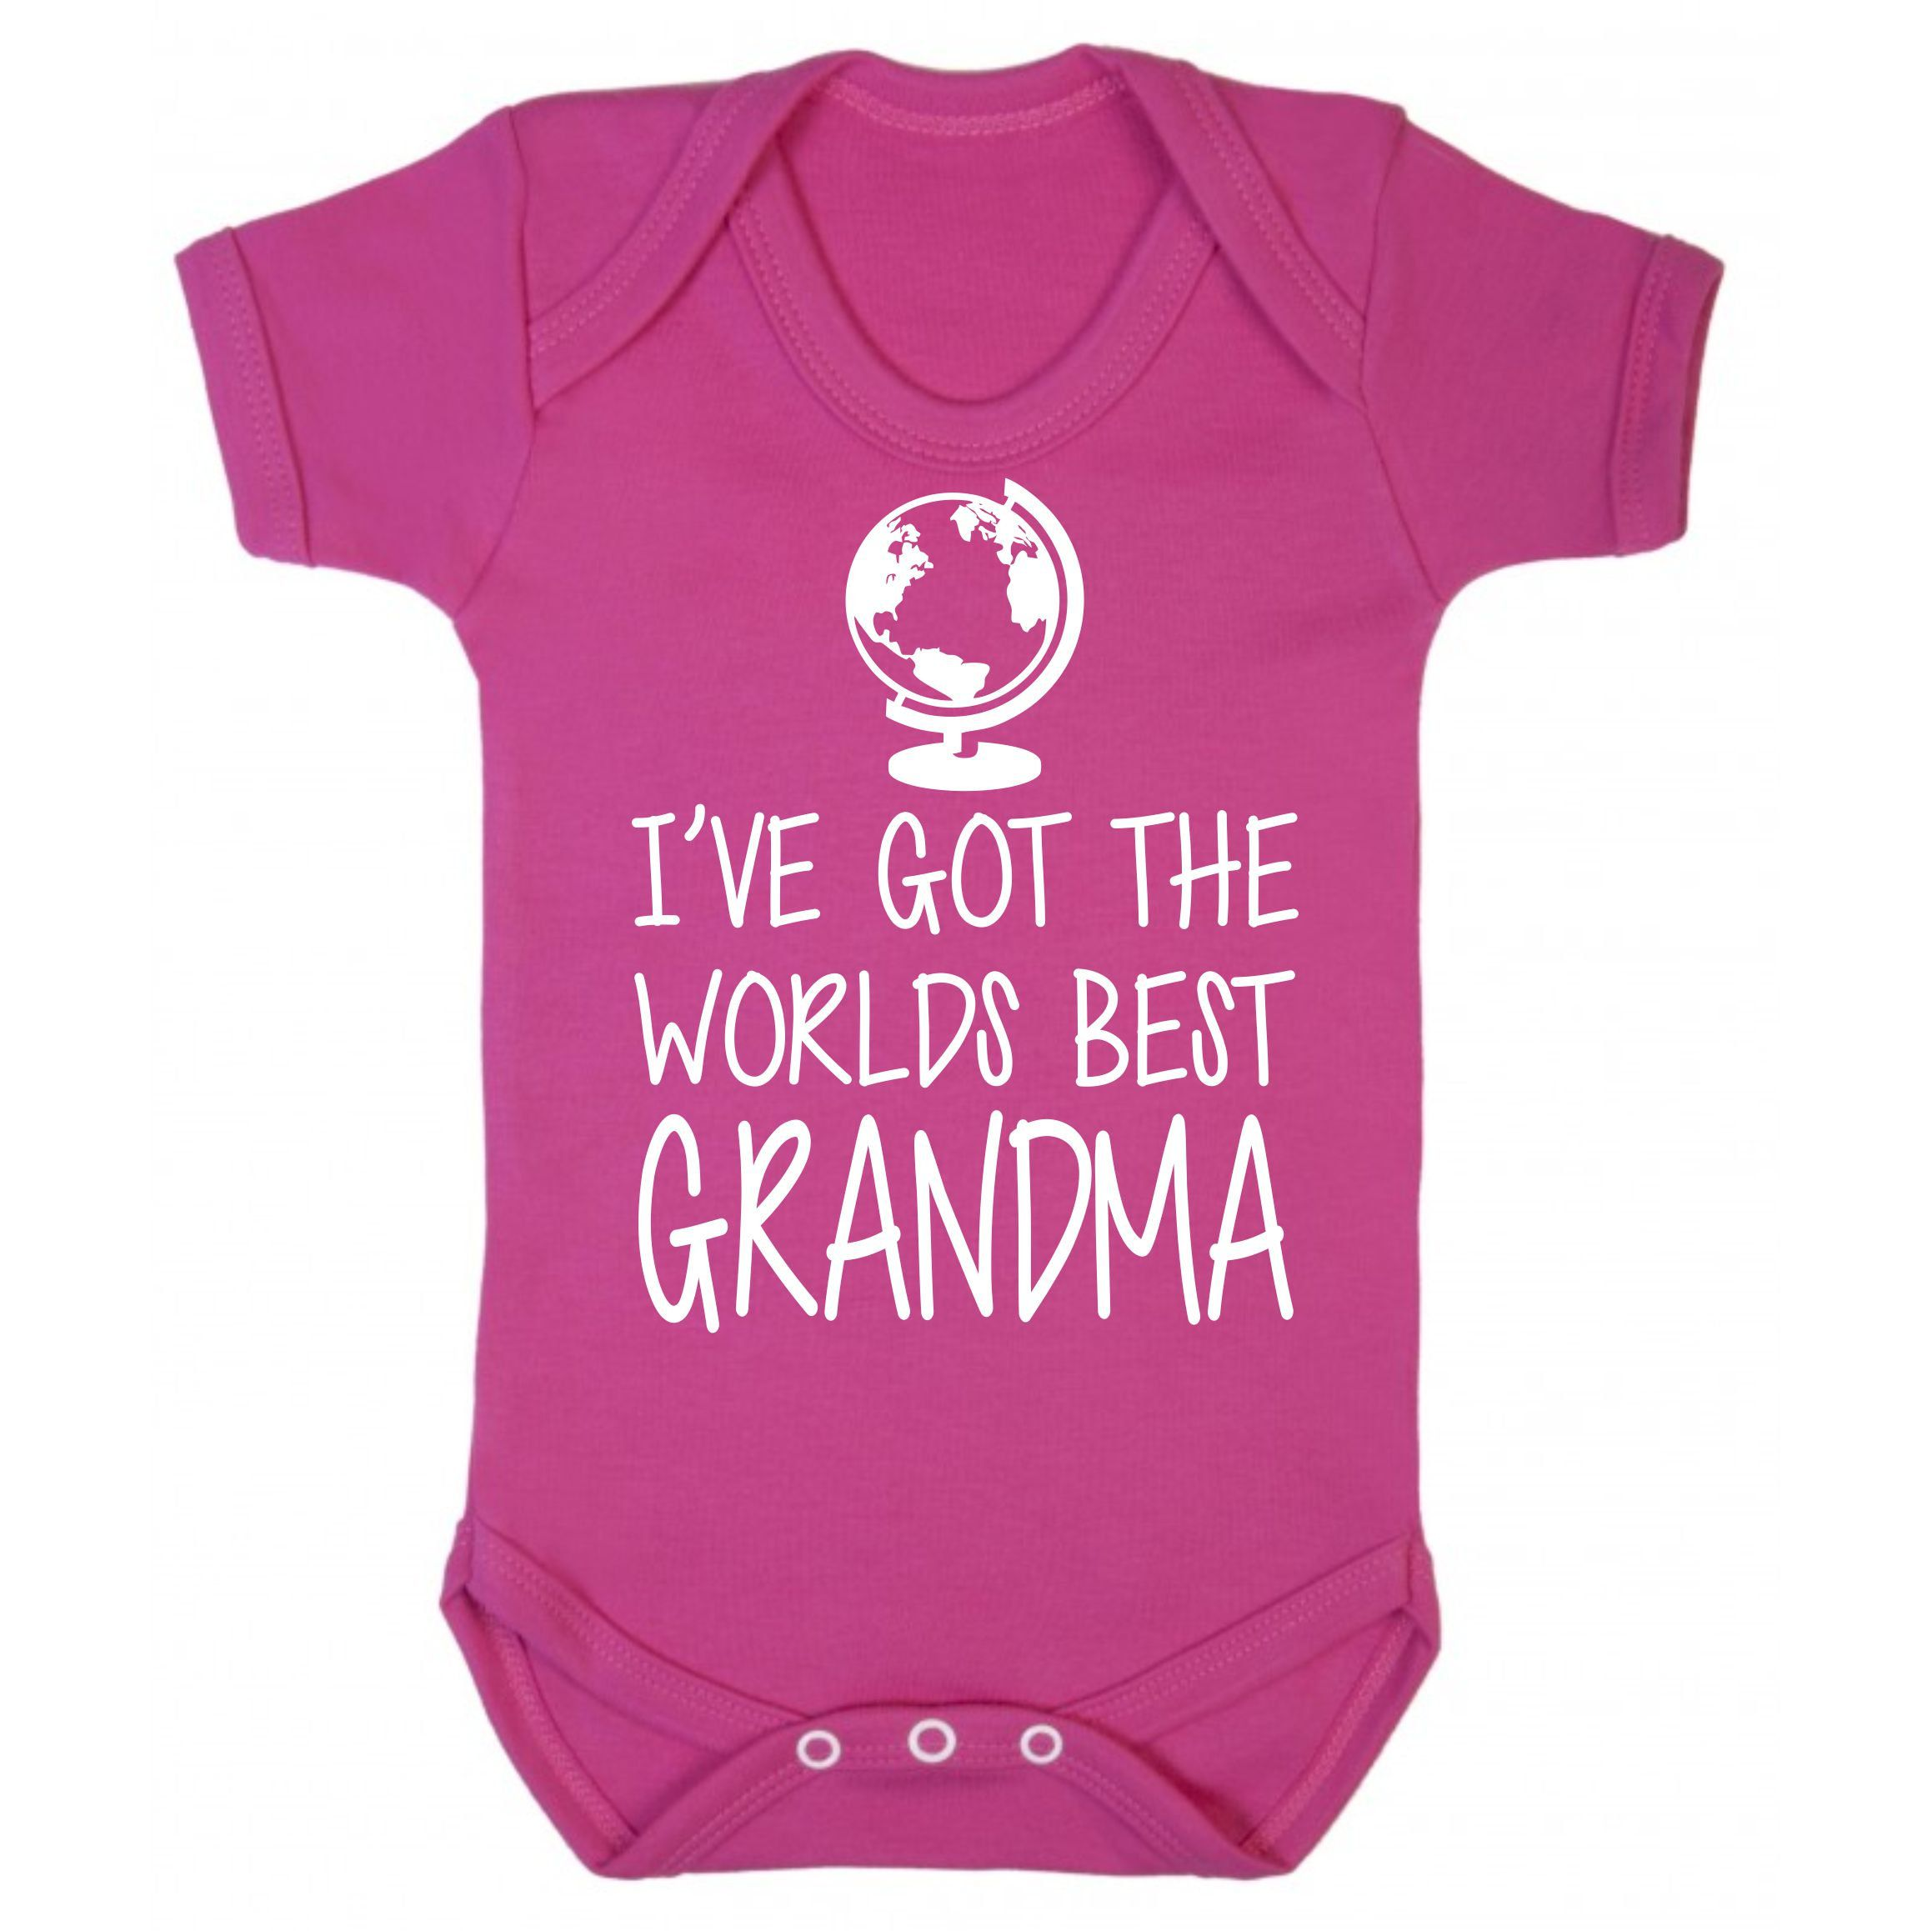 Eat Sleep Poo Repeat Bib Christening baby shower gifts for newborn boy girl